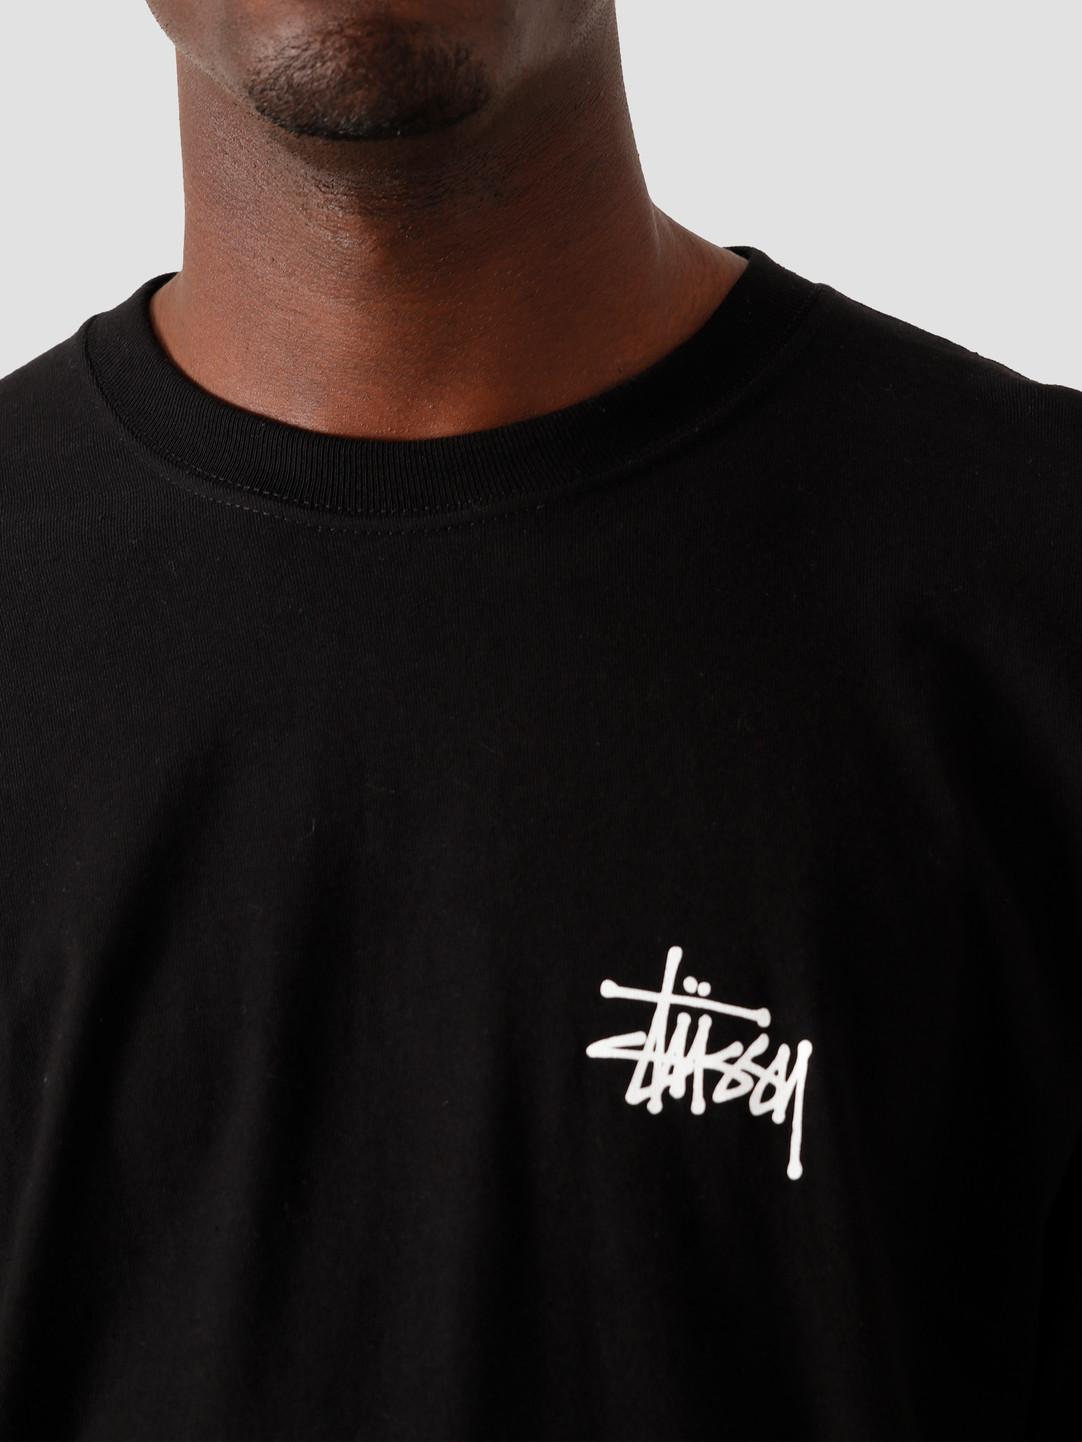 Stussy Stussy Basic Longsleeve T-Shirt Black 1994535